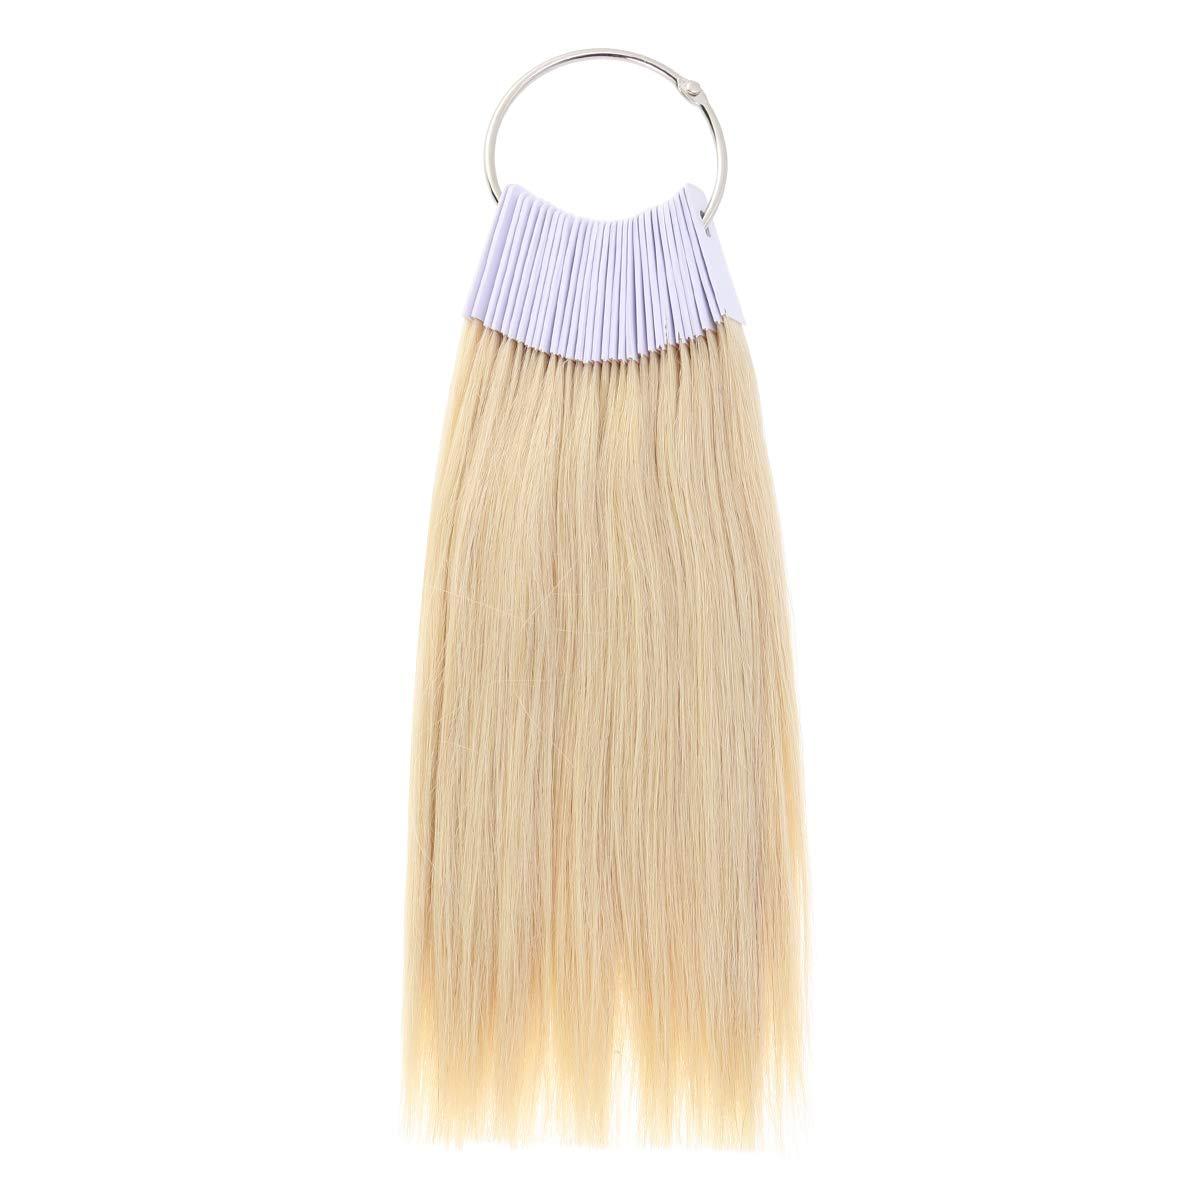 Amazon.com : 30Pcs Hair Color Rings Human Hair Swatches ...